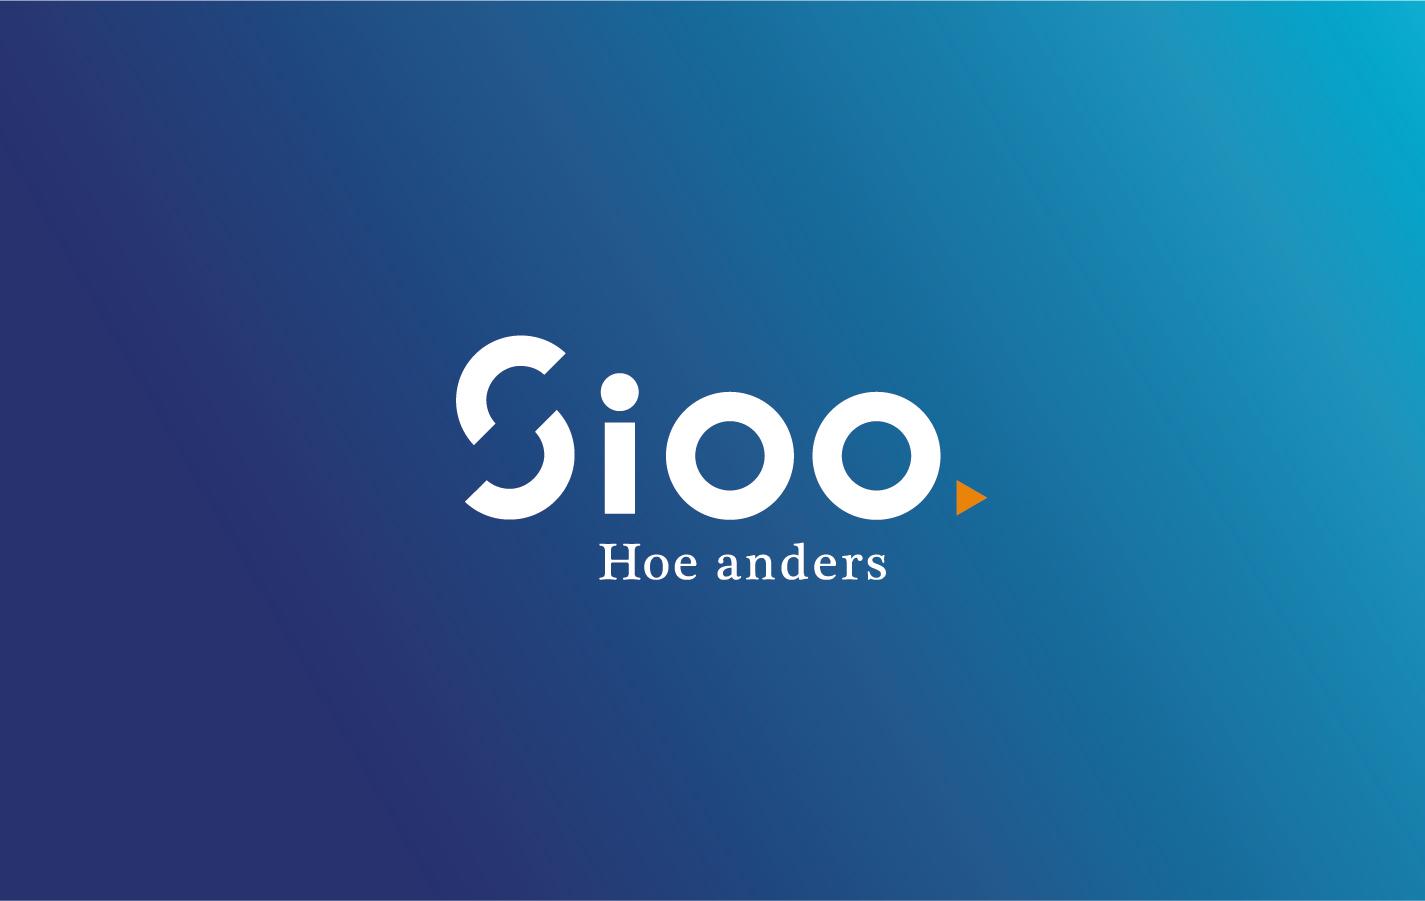 UnitR-Sioo Logo ontwerp Reclamebureau Utrecht Corporate Identity ontwerp